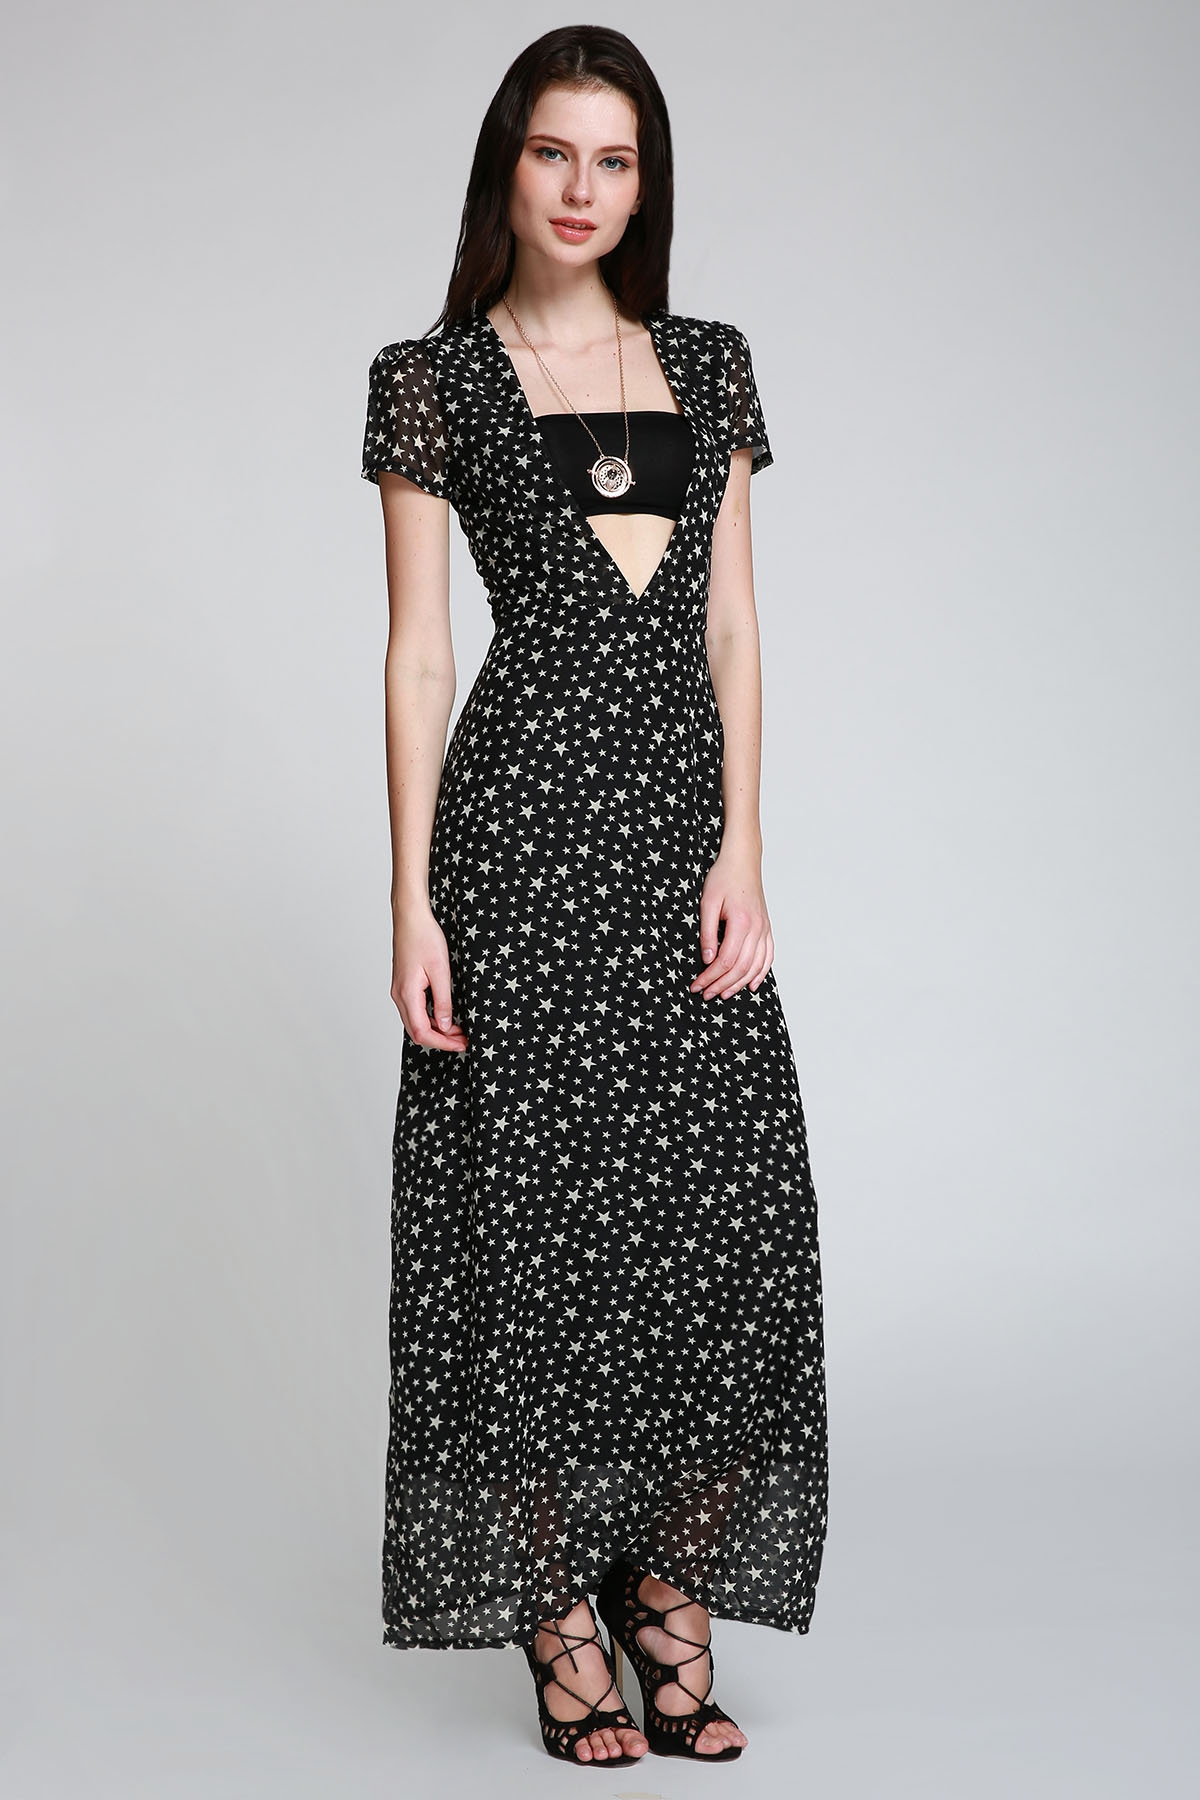 Plunging Neck Short Sleeve Full Star Print Maxi Dress